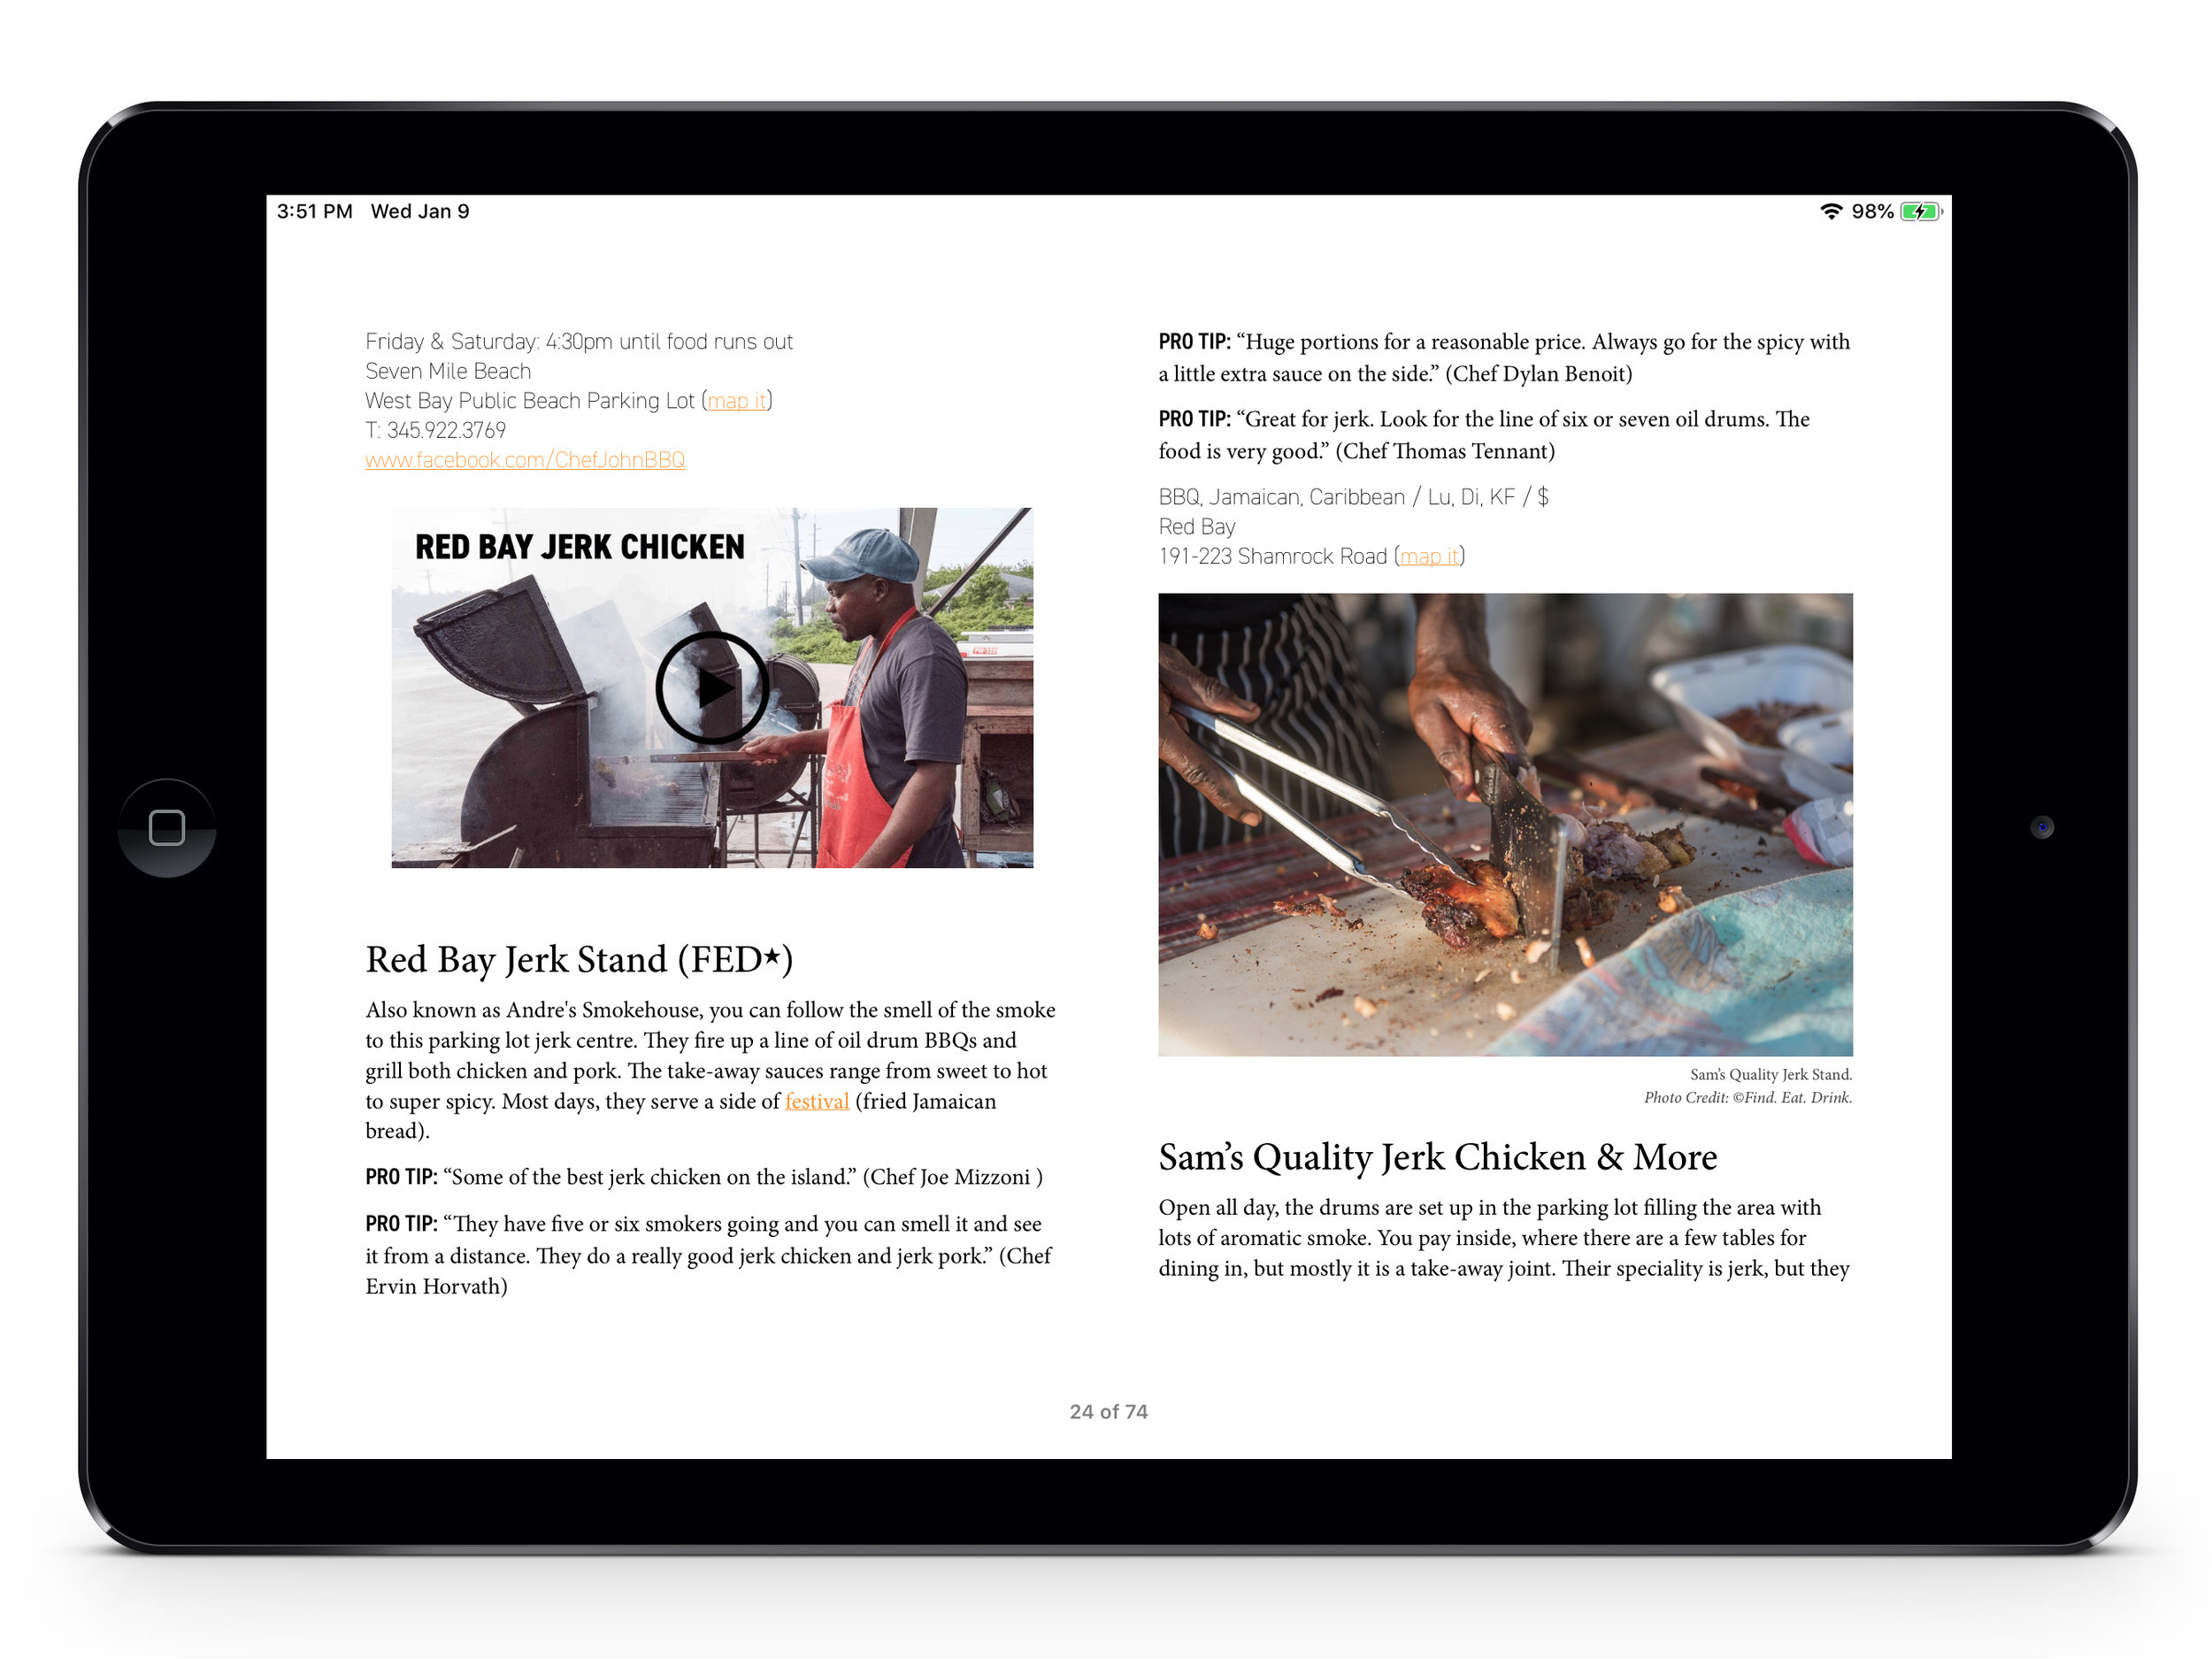 iPadAir_GrandCayman_Screenshots_Landscape_1.8.jpg